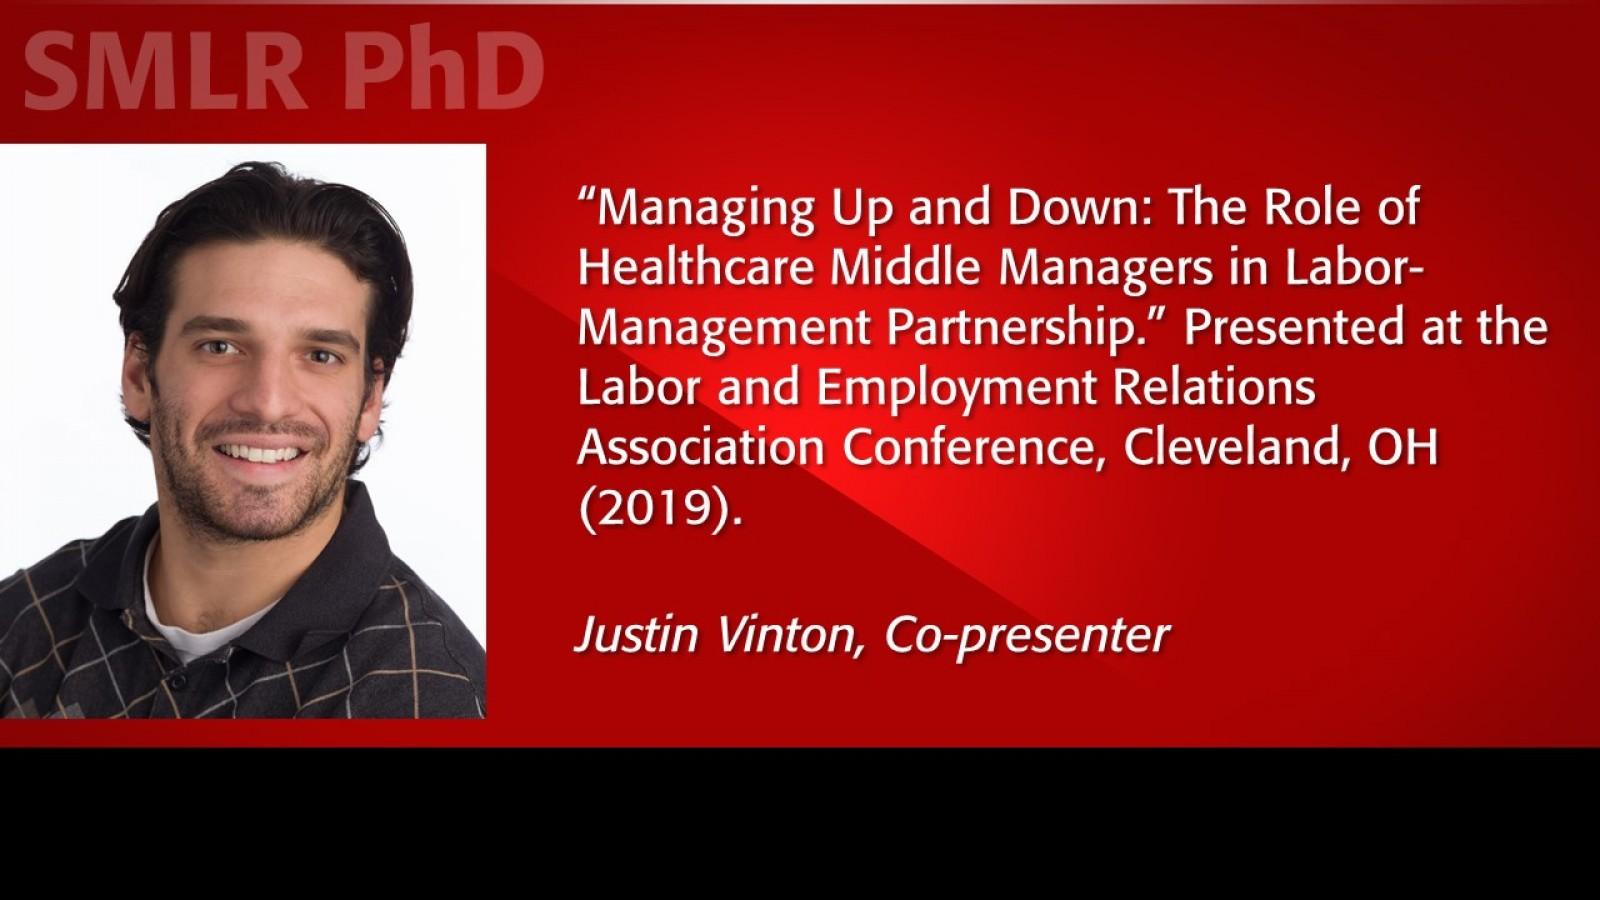 Image of Justin Vinton